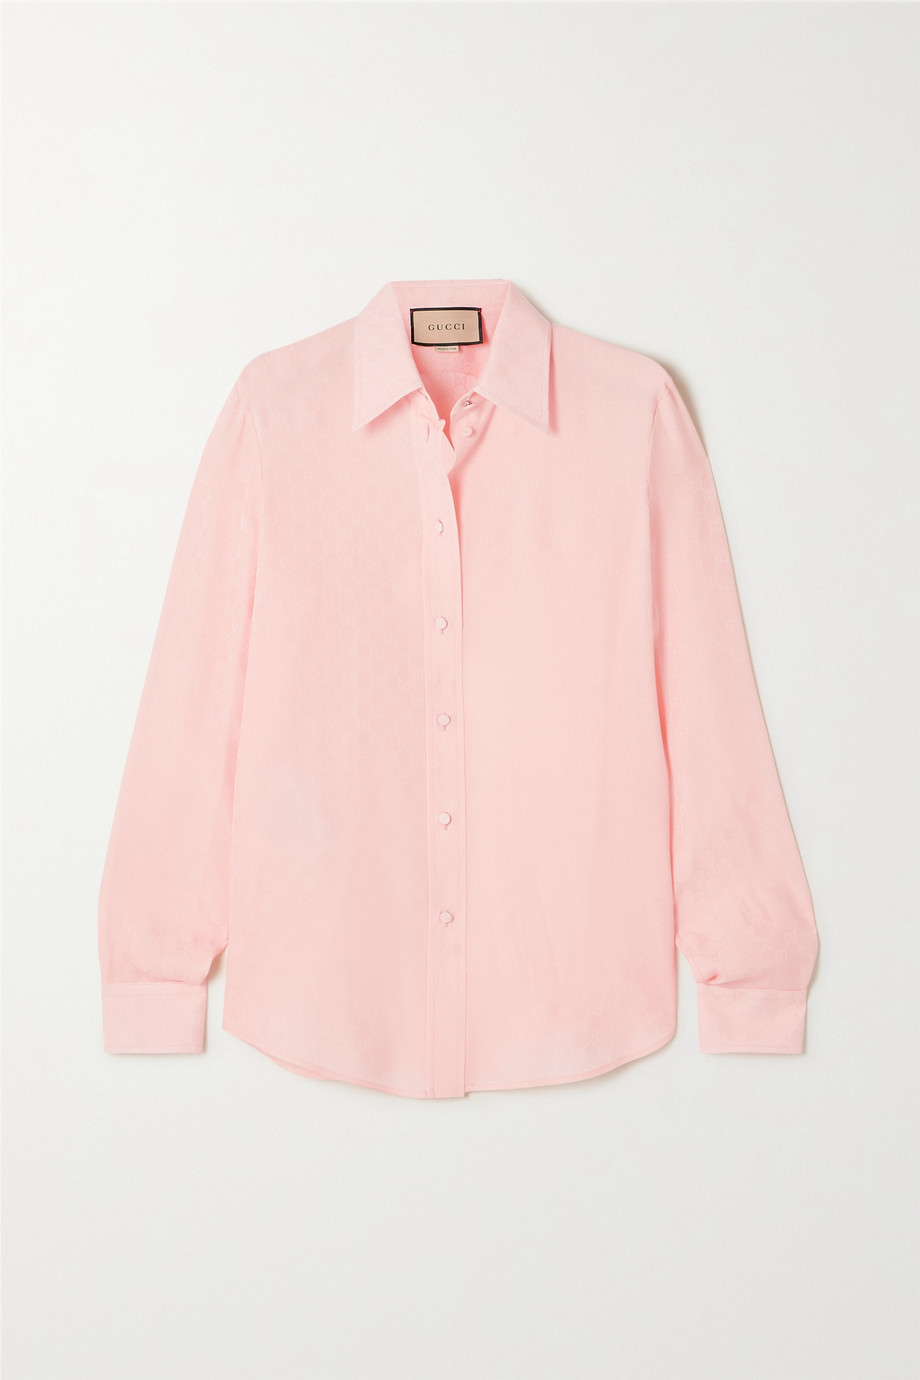 Gucci Silk-jacquard shirt